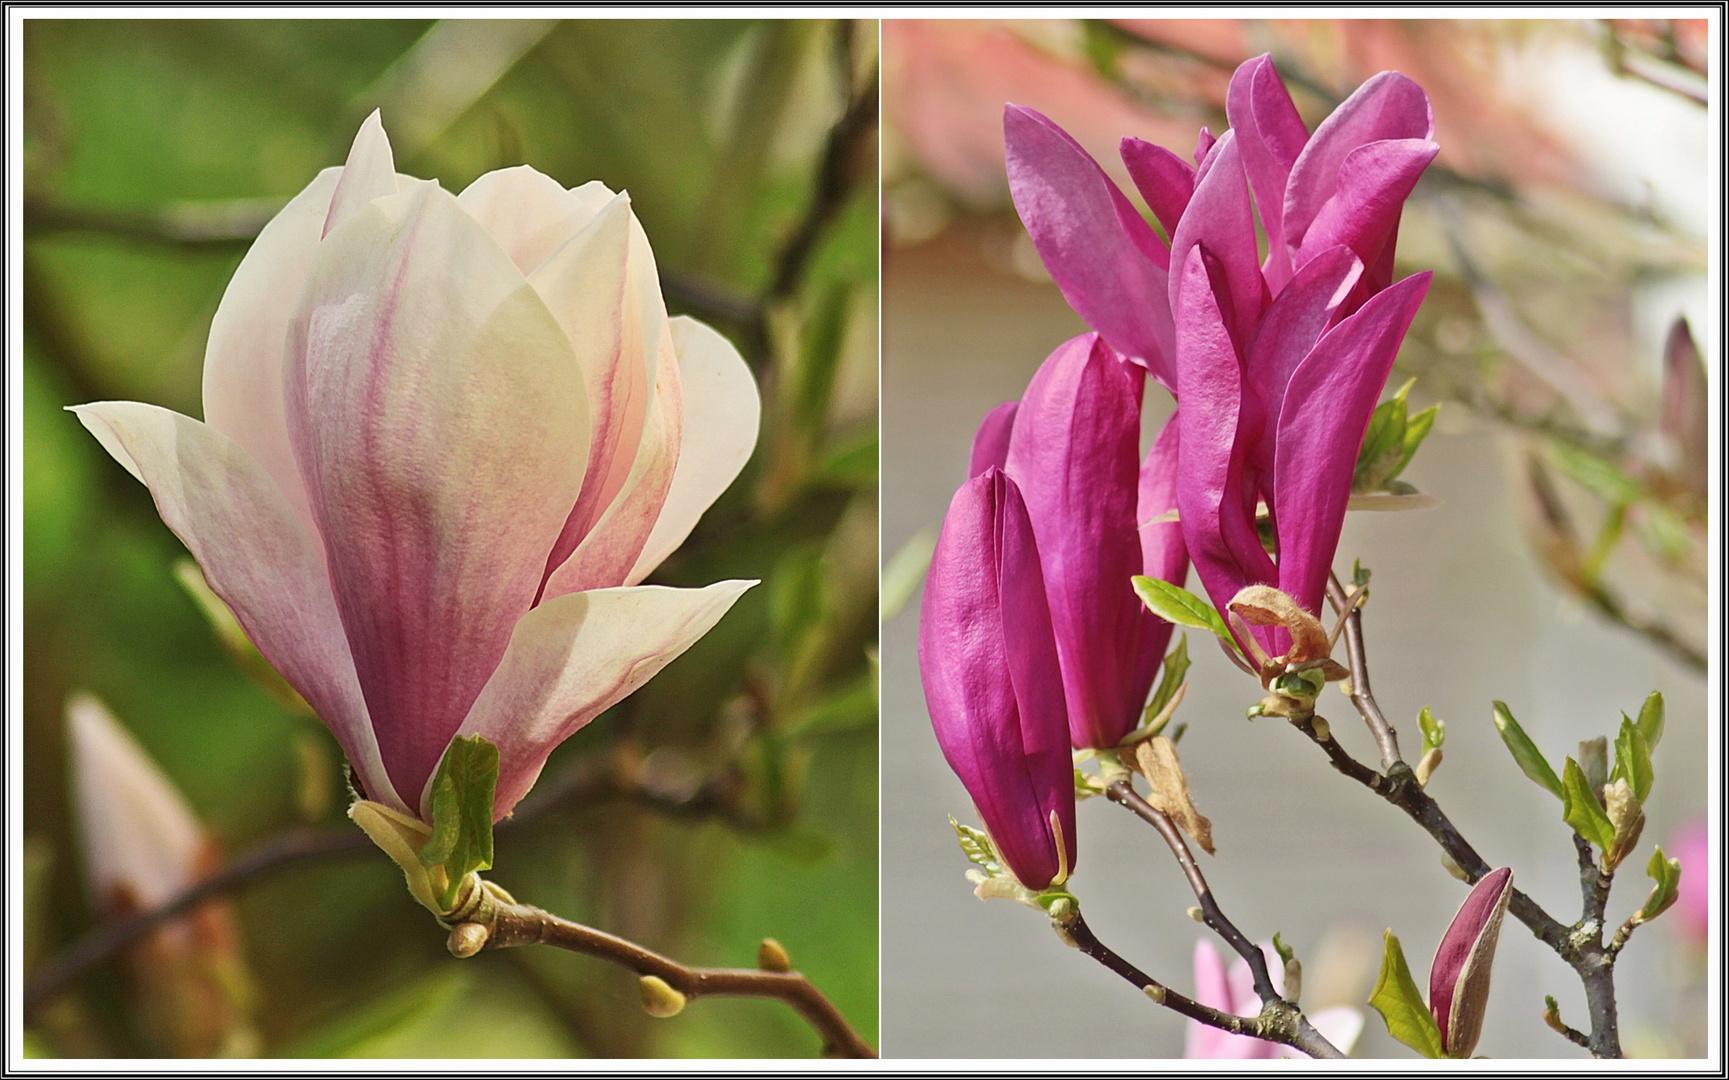 Full Size of Magnolia Farbe Zwei Farben Der Magnolie Foto Bild Pflanzen Wohnzimmer Magnolia Farbe